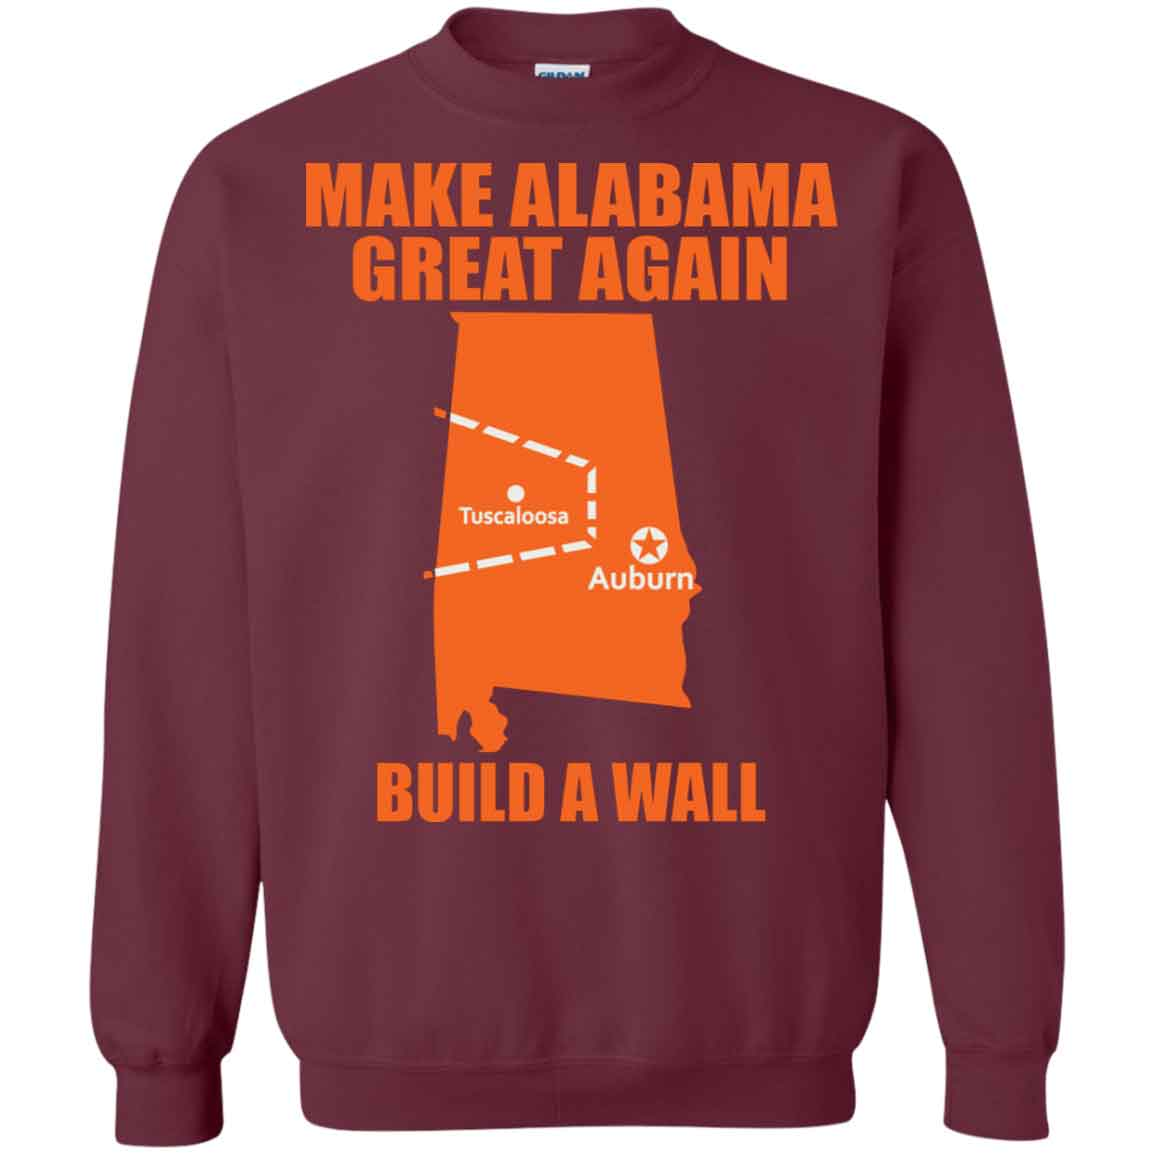 a28b4ae588 Map Make Alabama Great Again Build A Wall Hoodies Sweatshirts – TeeTrio